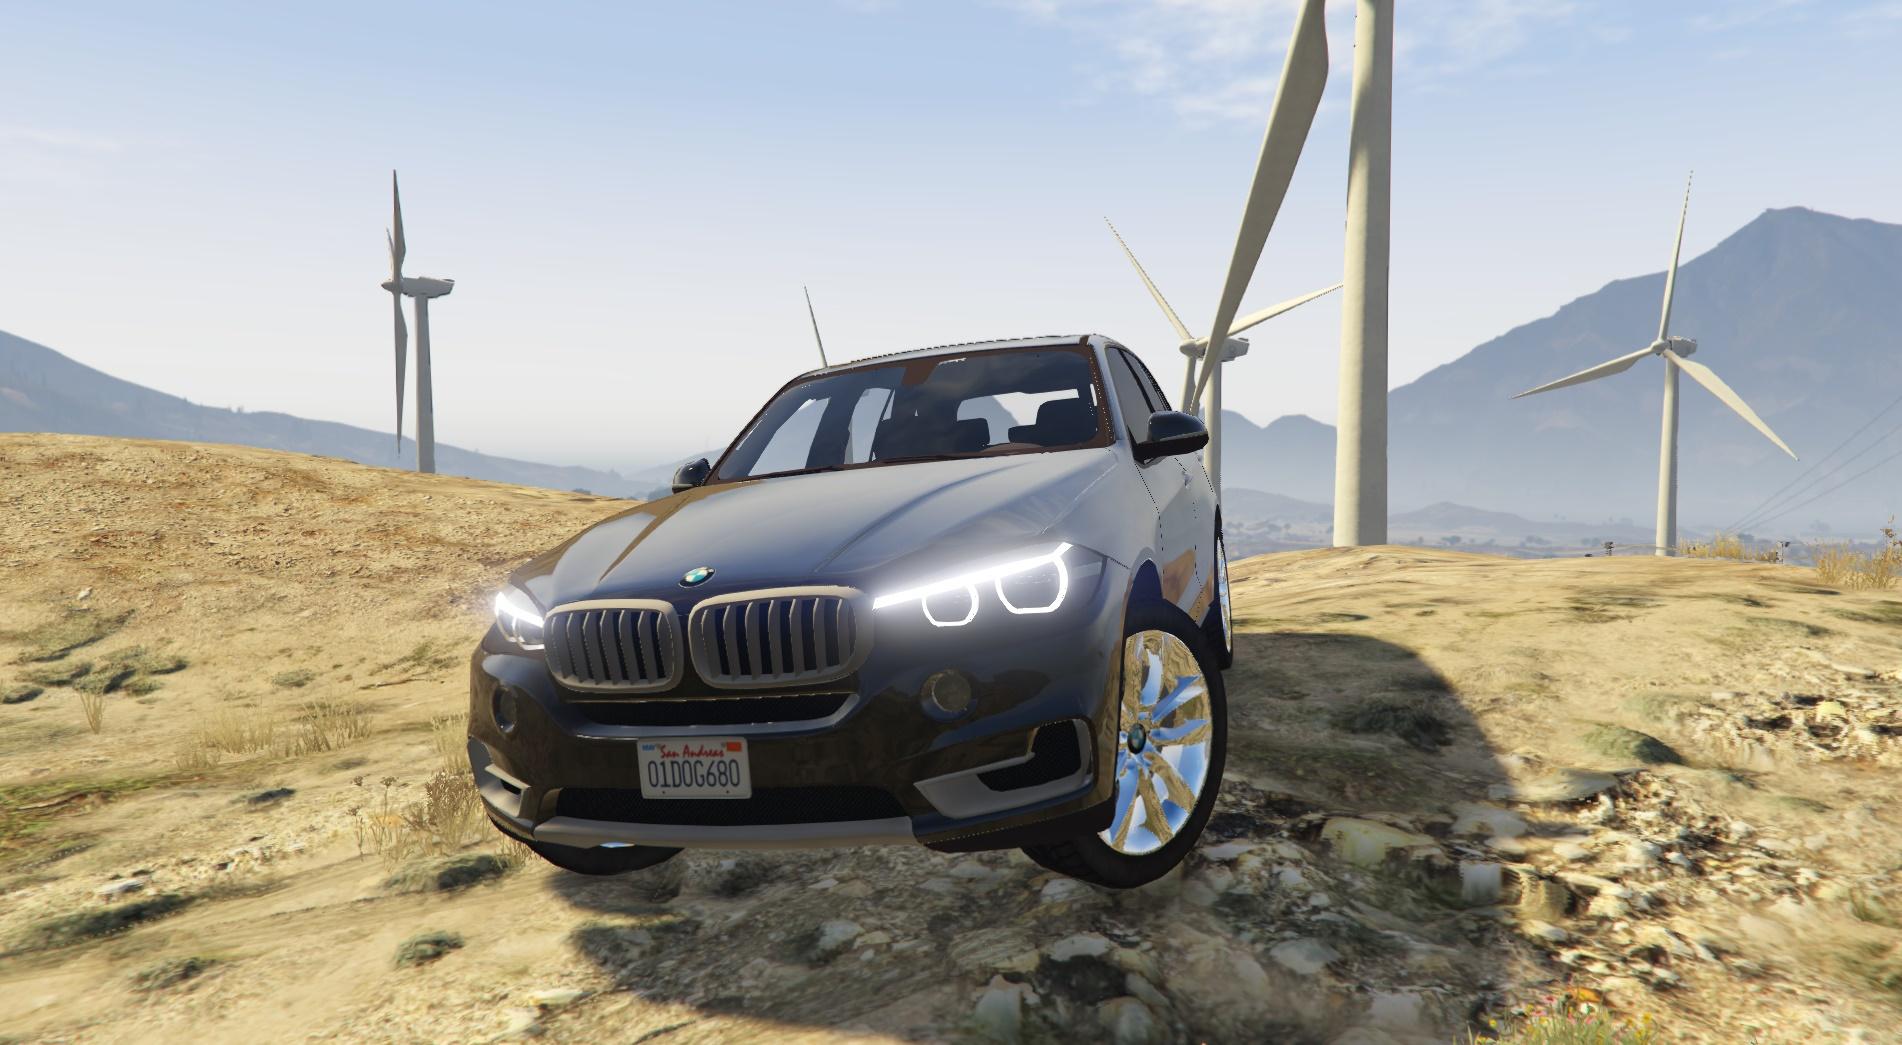 2014 BMW X5 [Add-On] - GTA5-Mods.com